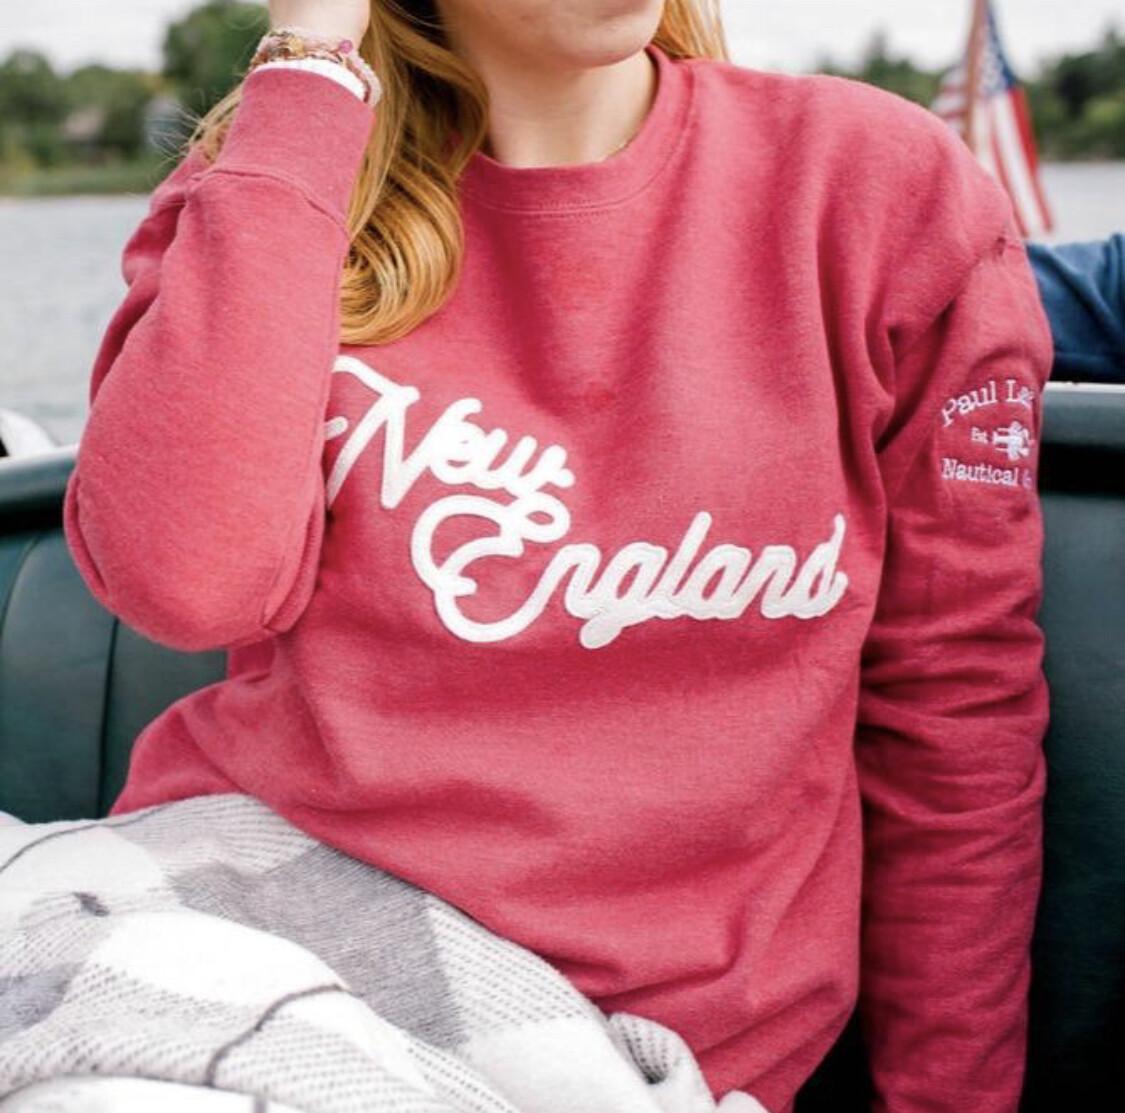 New England Sweatshirt - Red